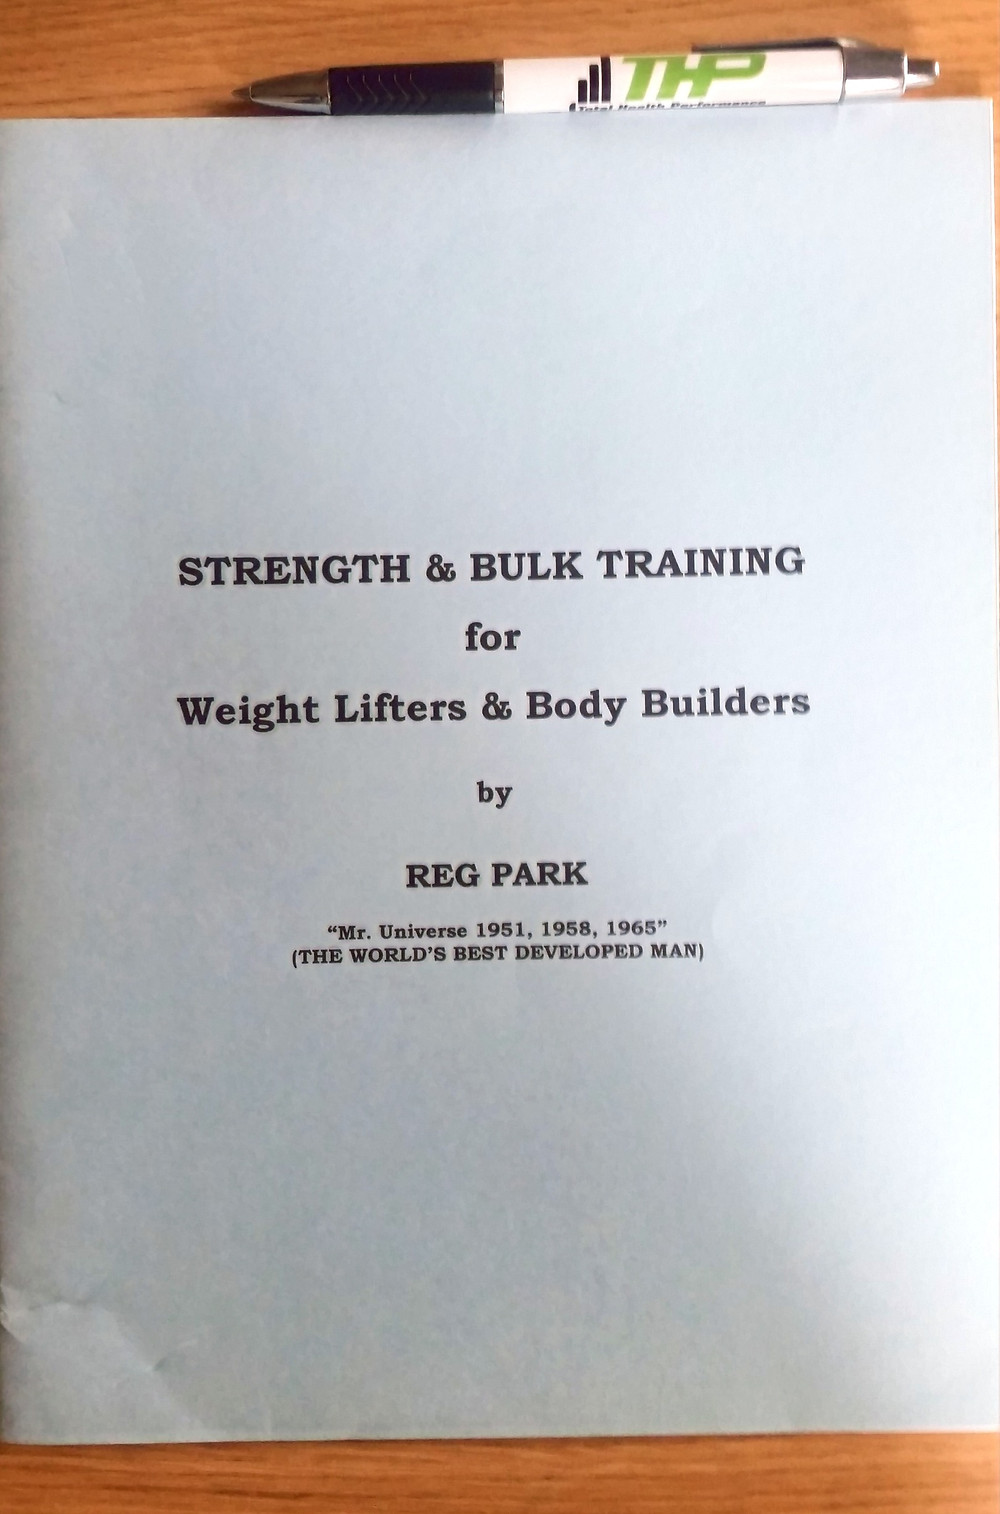 Reg Park Strength and Bulk Training Book Total Health Performance Narellan